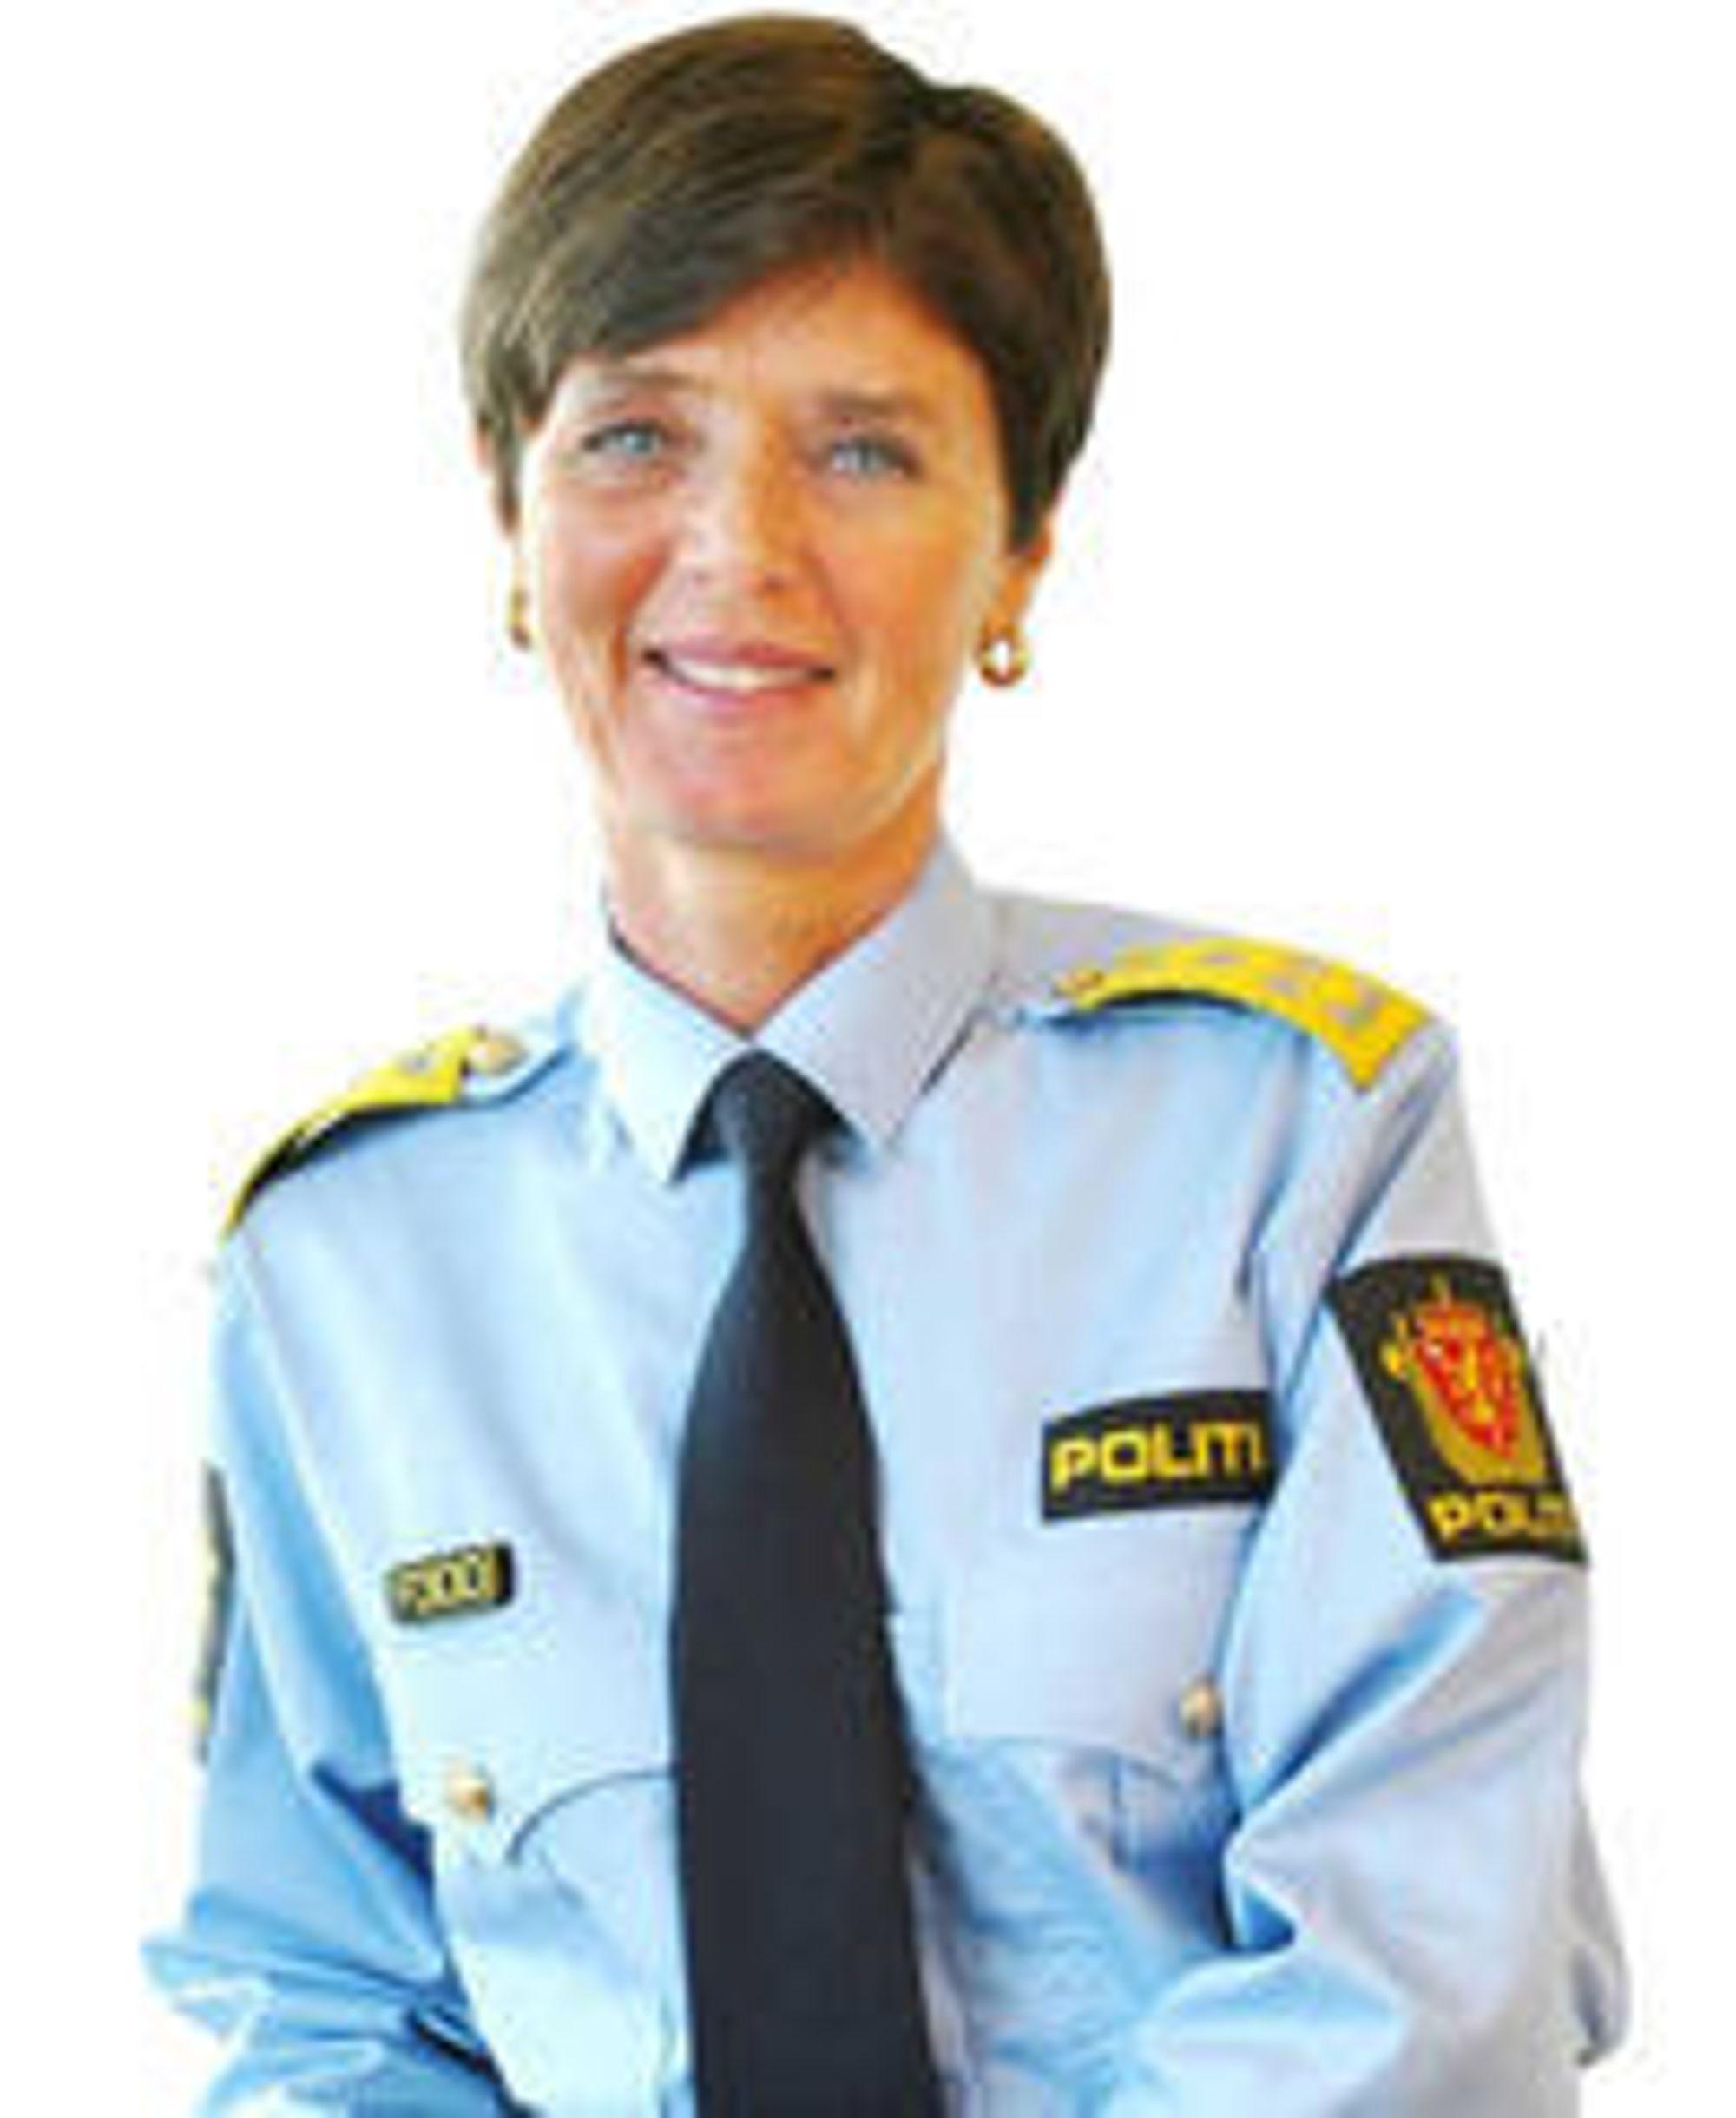 Politidirektør Ingelin Killengreen har søkt stillingen som departementsråd i FAD.